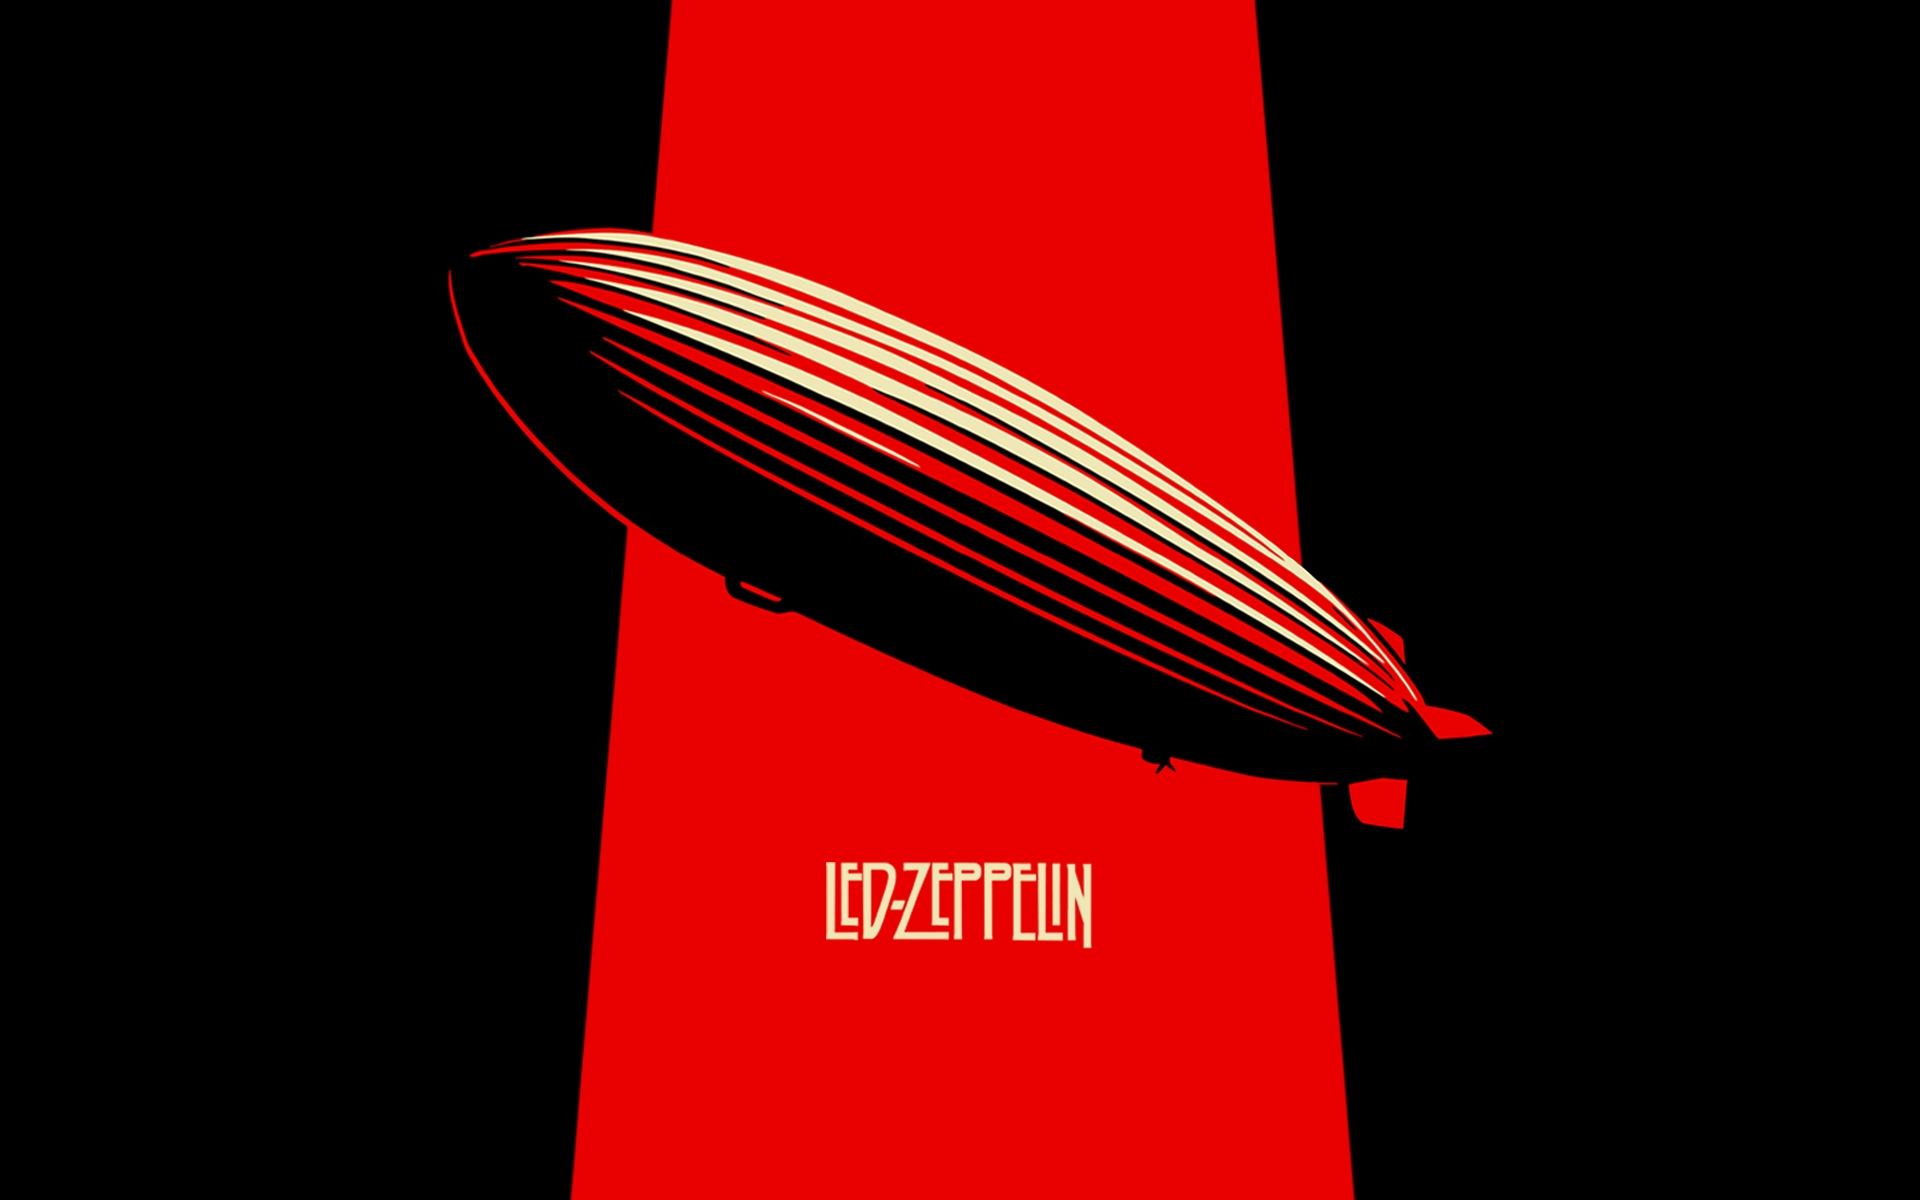 led zeppelin full hd fond d'écran and arrière-plan   1920x1200   id